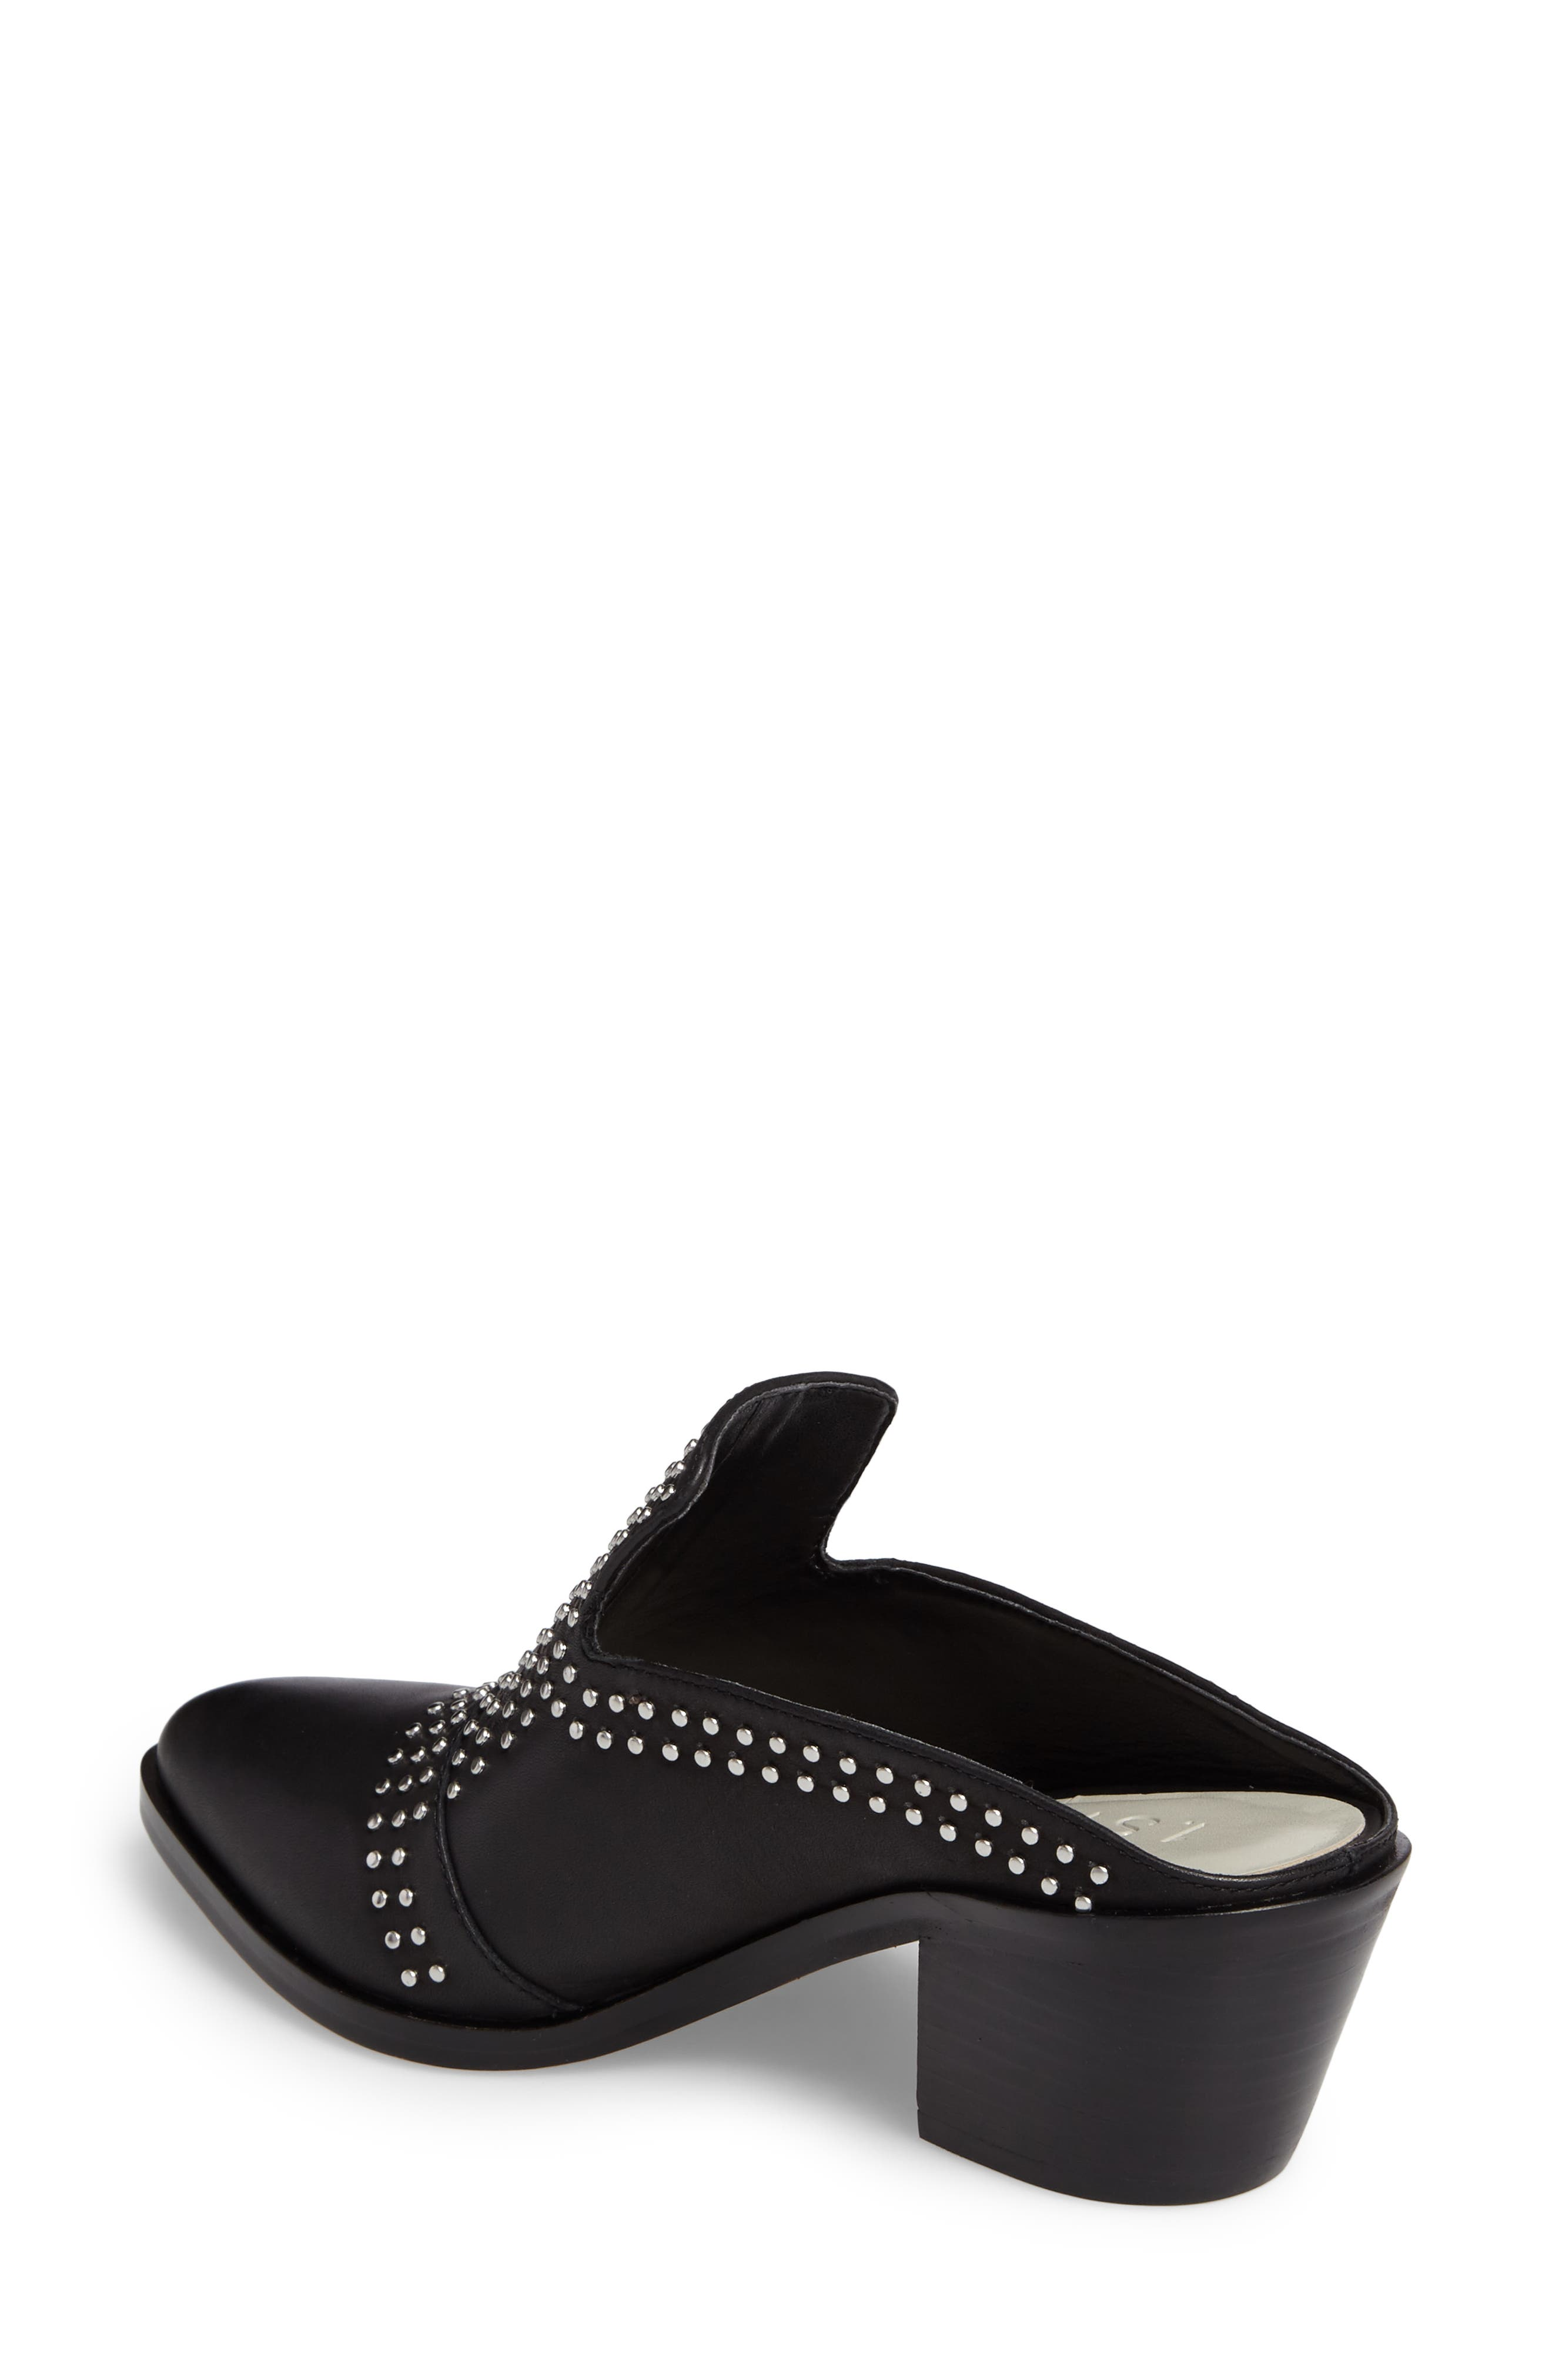 Lon Studded Loafer Mule,                             Alternate thumbnail 2, color,                             Black Leather